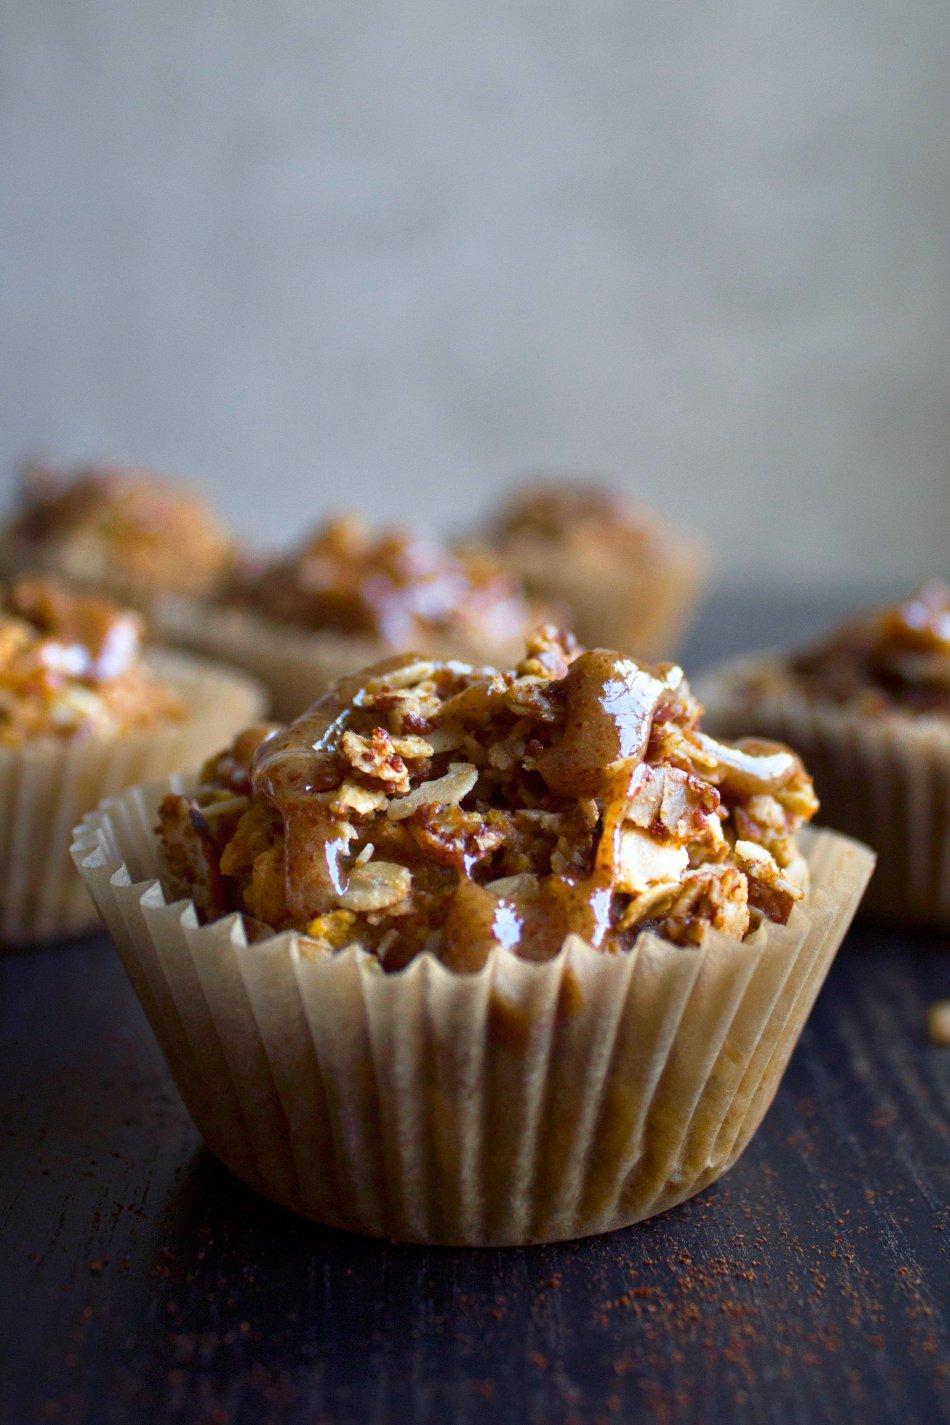 Glazed Pumpkin Crumb Muffins {Gluten-Free, Dairy-Free}